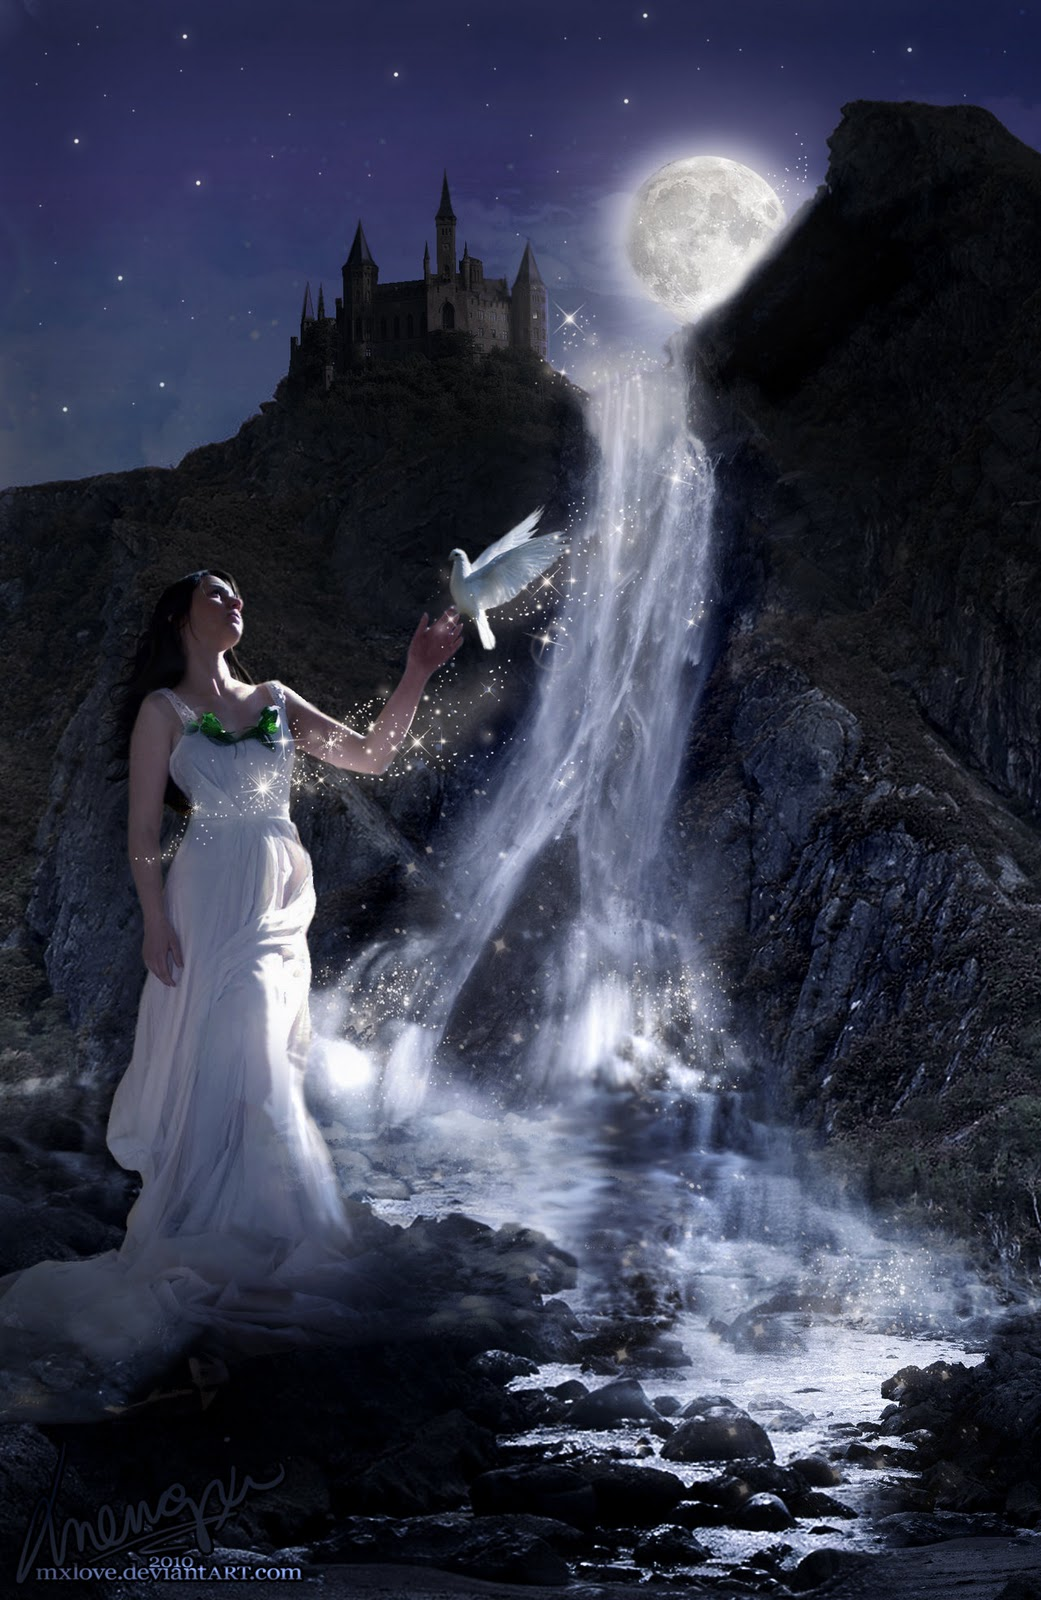 Moon Goddess Wallpaper - WallpaperSafari